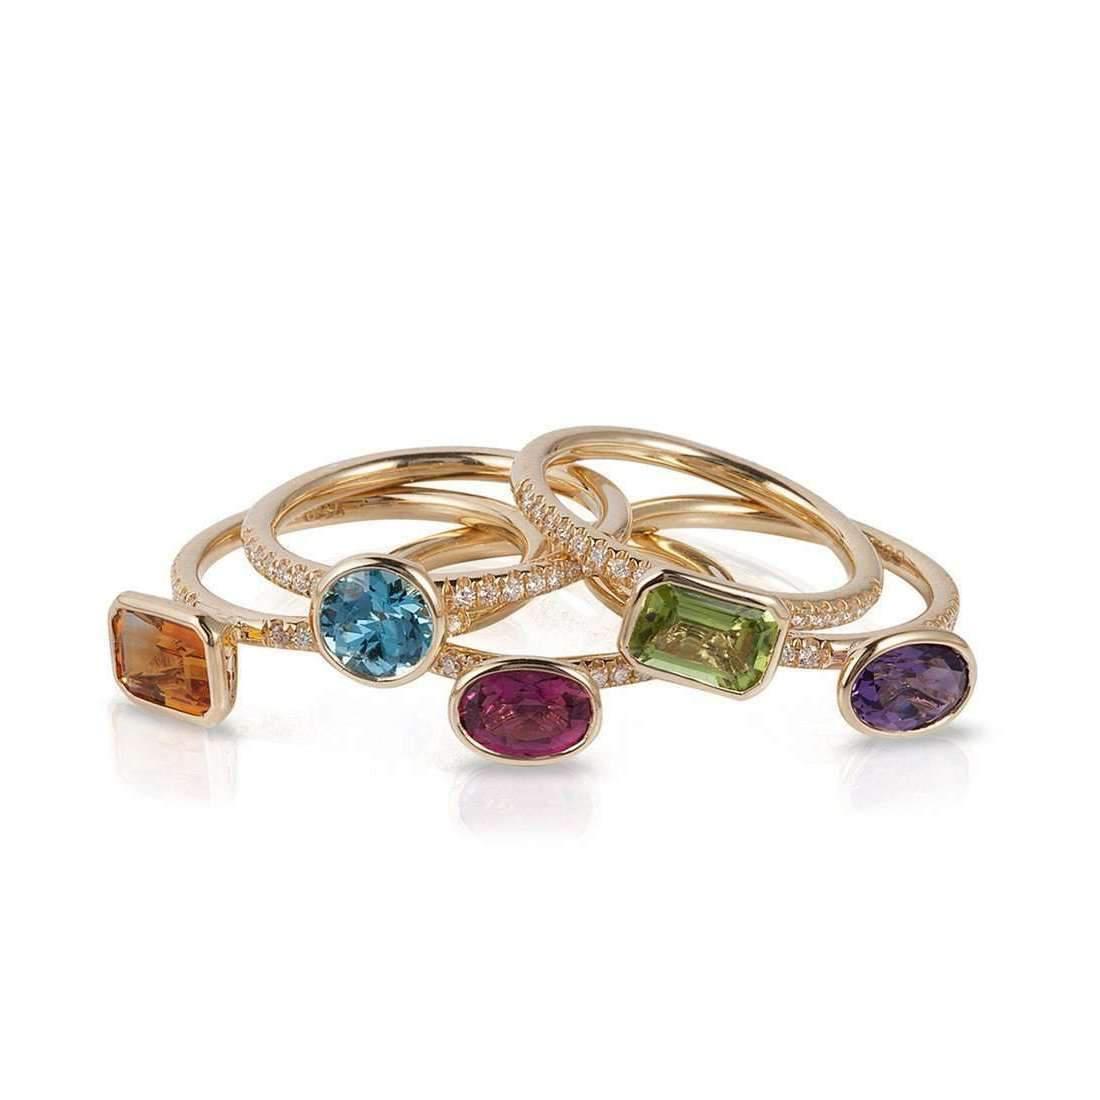 Goshwara Gossip Rubelite Oval Stackable Rings with Diamonds - 6.5 (M) gWBUUt